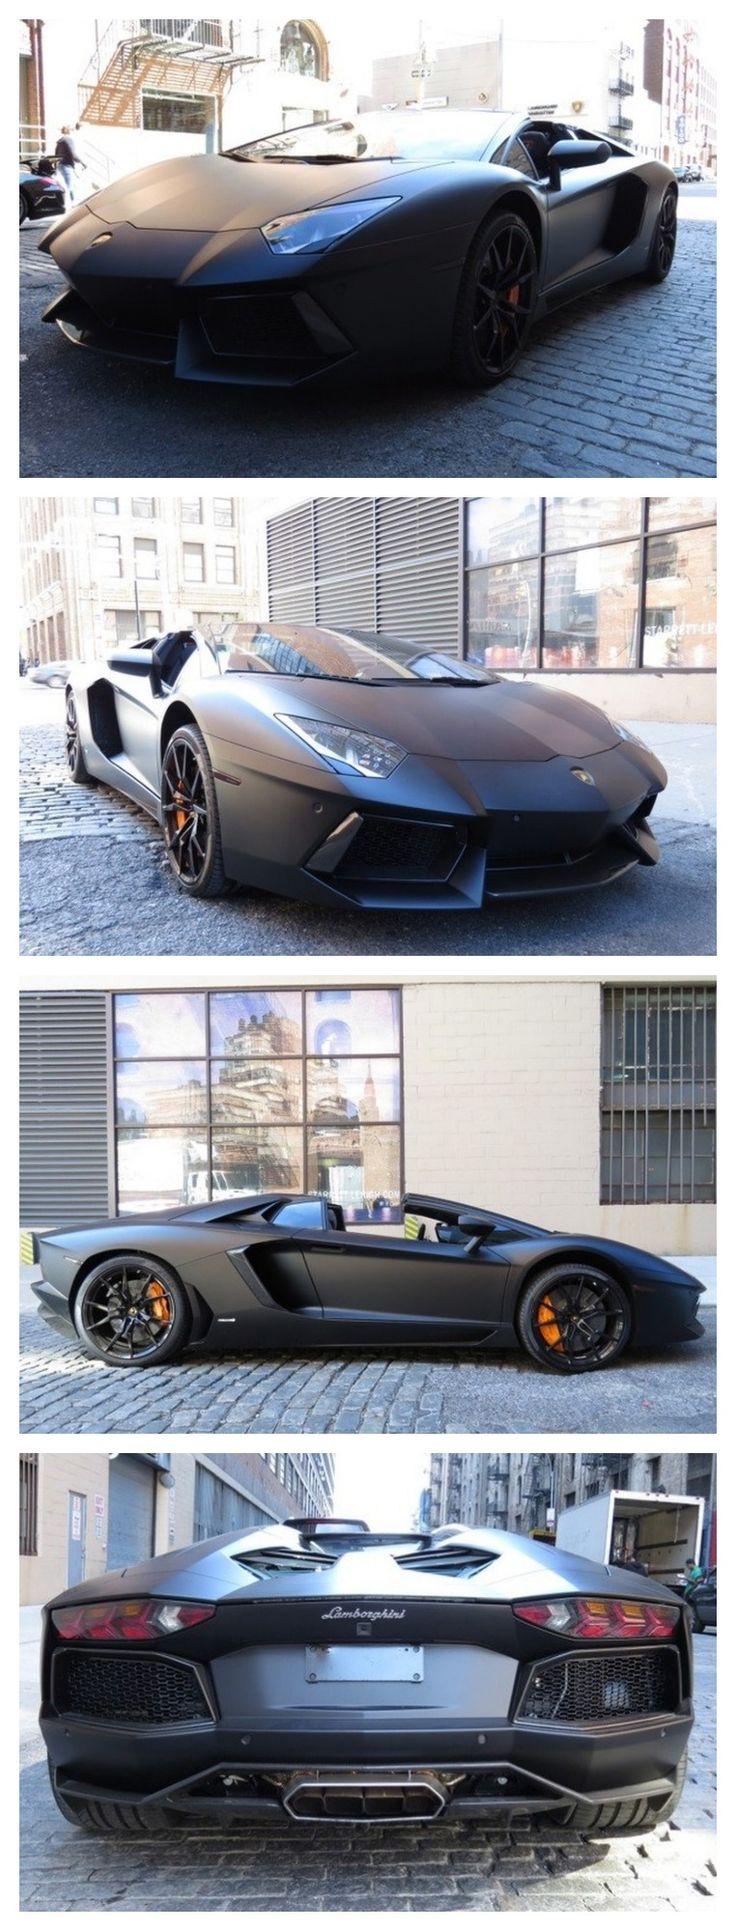 Meet the NEMESIS! Check out this badass #Lamborghini Aventador Roadster Nero Nemesis #SupercarSunday